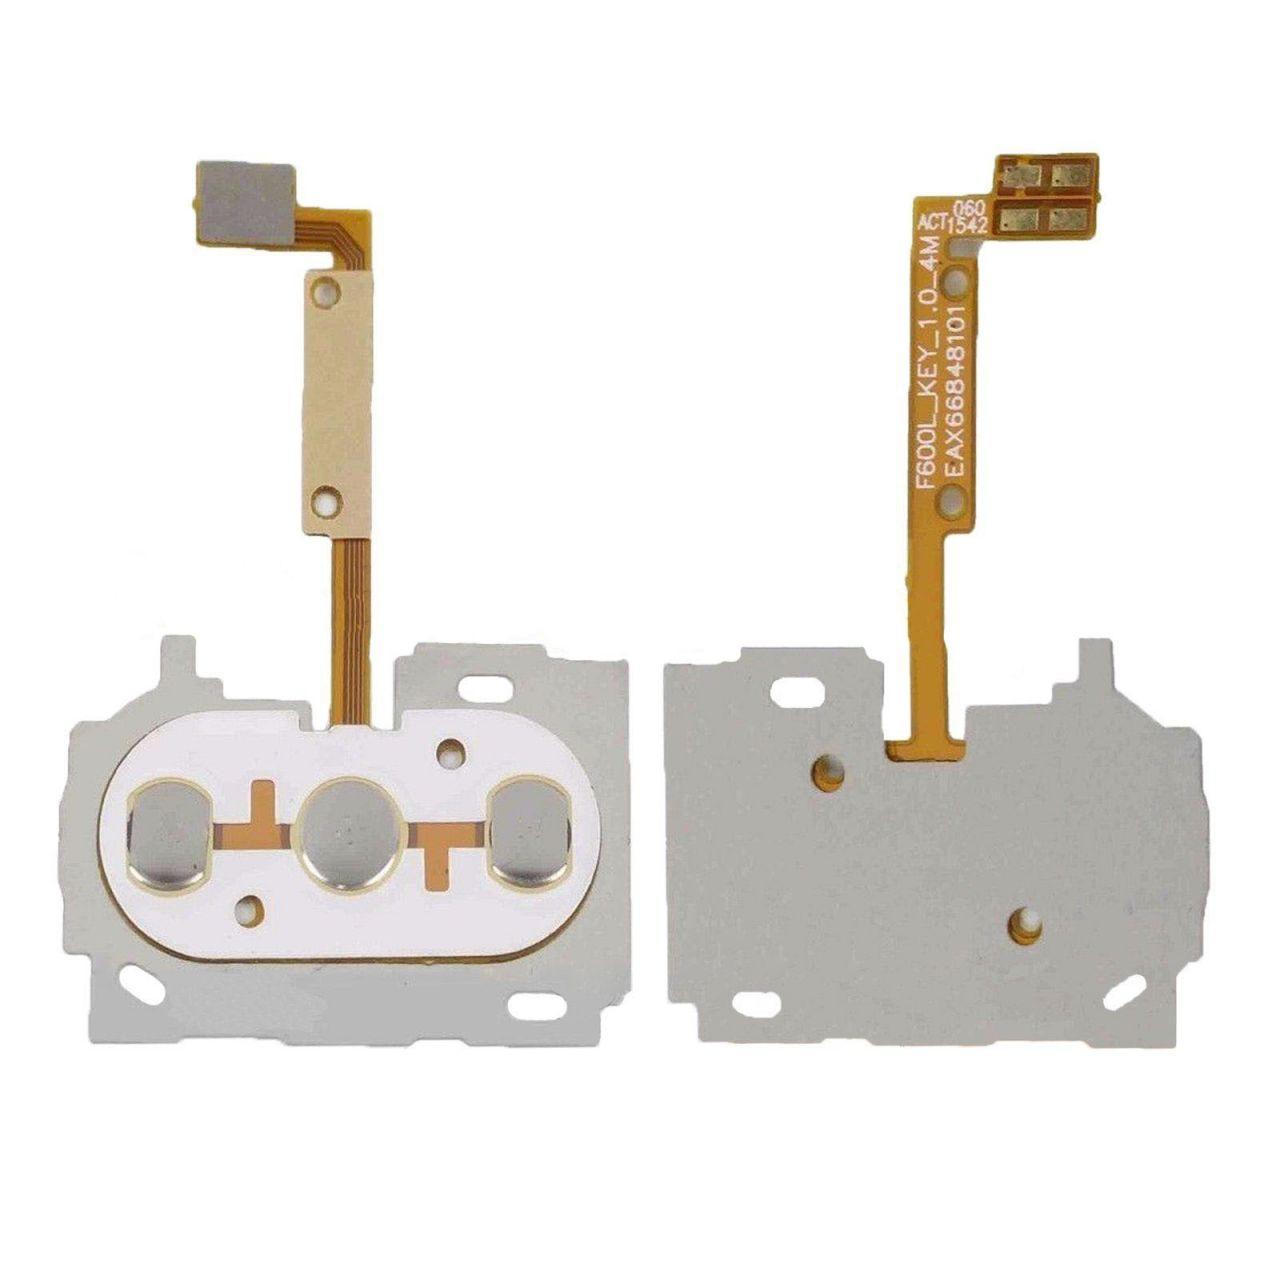 Шлейф Lg H900 V10 / H901 / H960A / H961 / H962 / H968 / VS990 с кнопкой включения с кнопками регулировки громкости